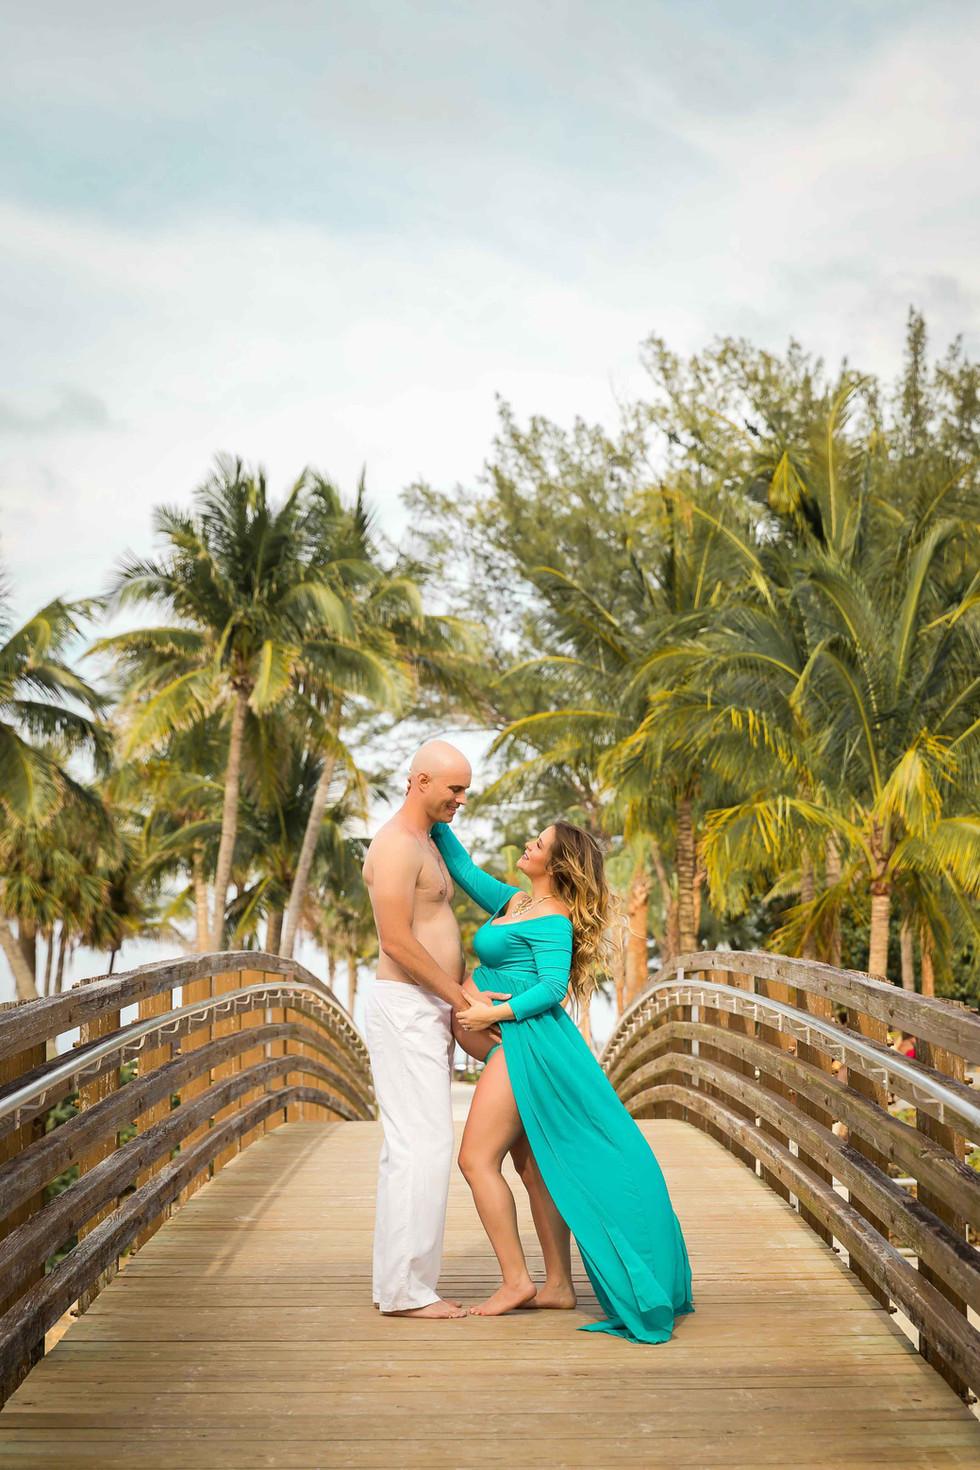 Professional Maternity Photography, Boca Raton, FL.